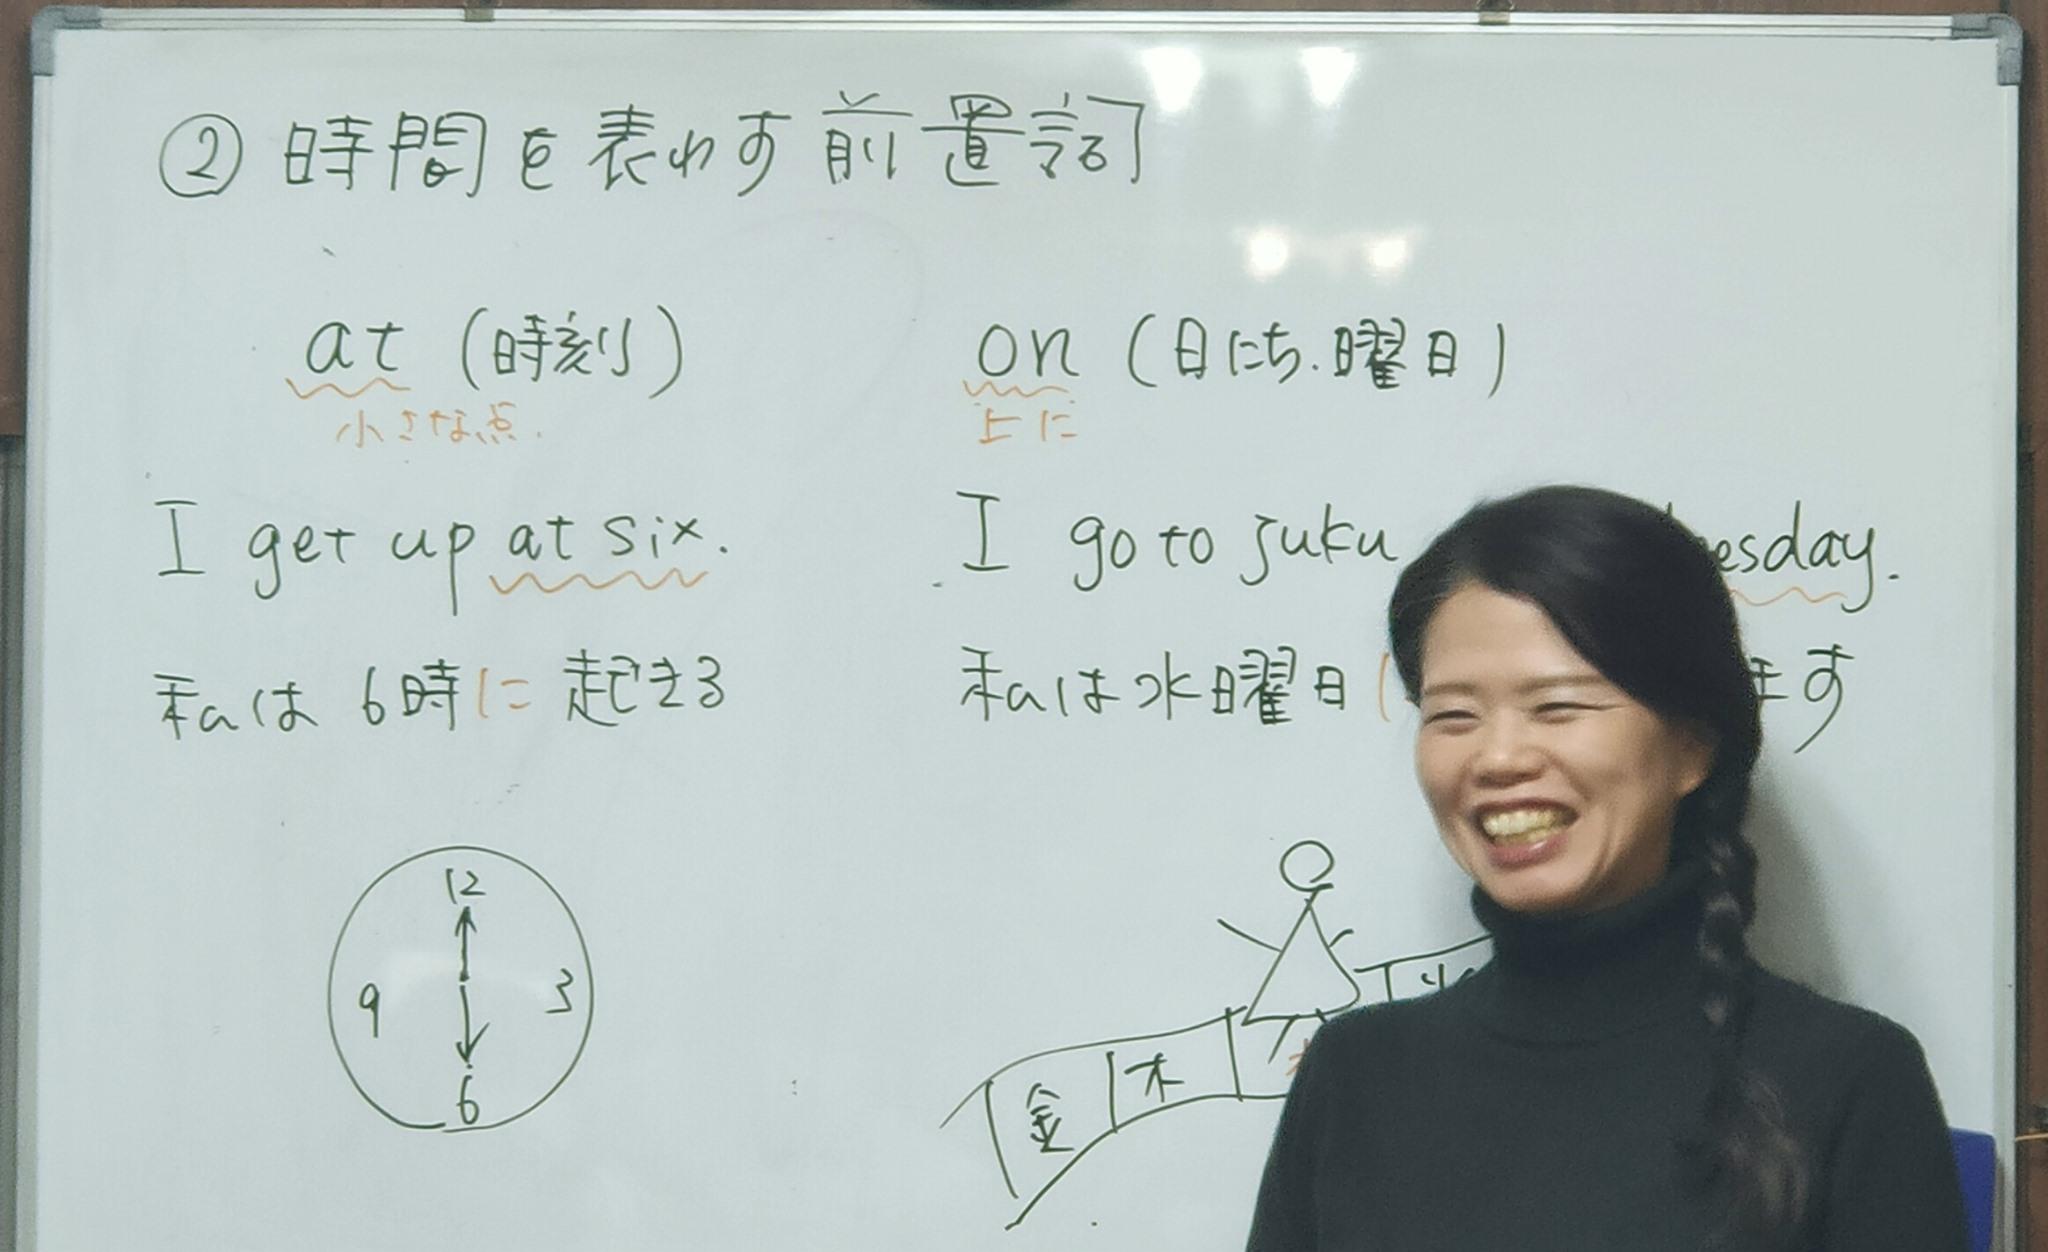 6/14 E's class 中学英語 はじめの一歩(無料体験) 〜英文の時間は動詞が決める ➀現在形と進行形の違い〜